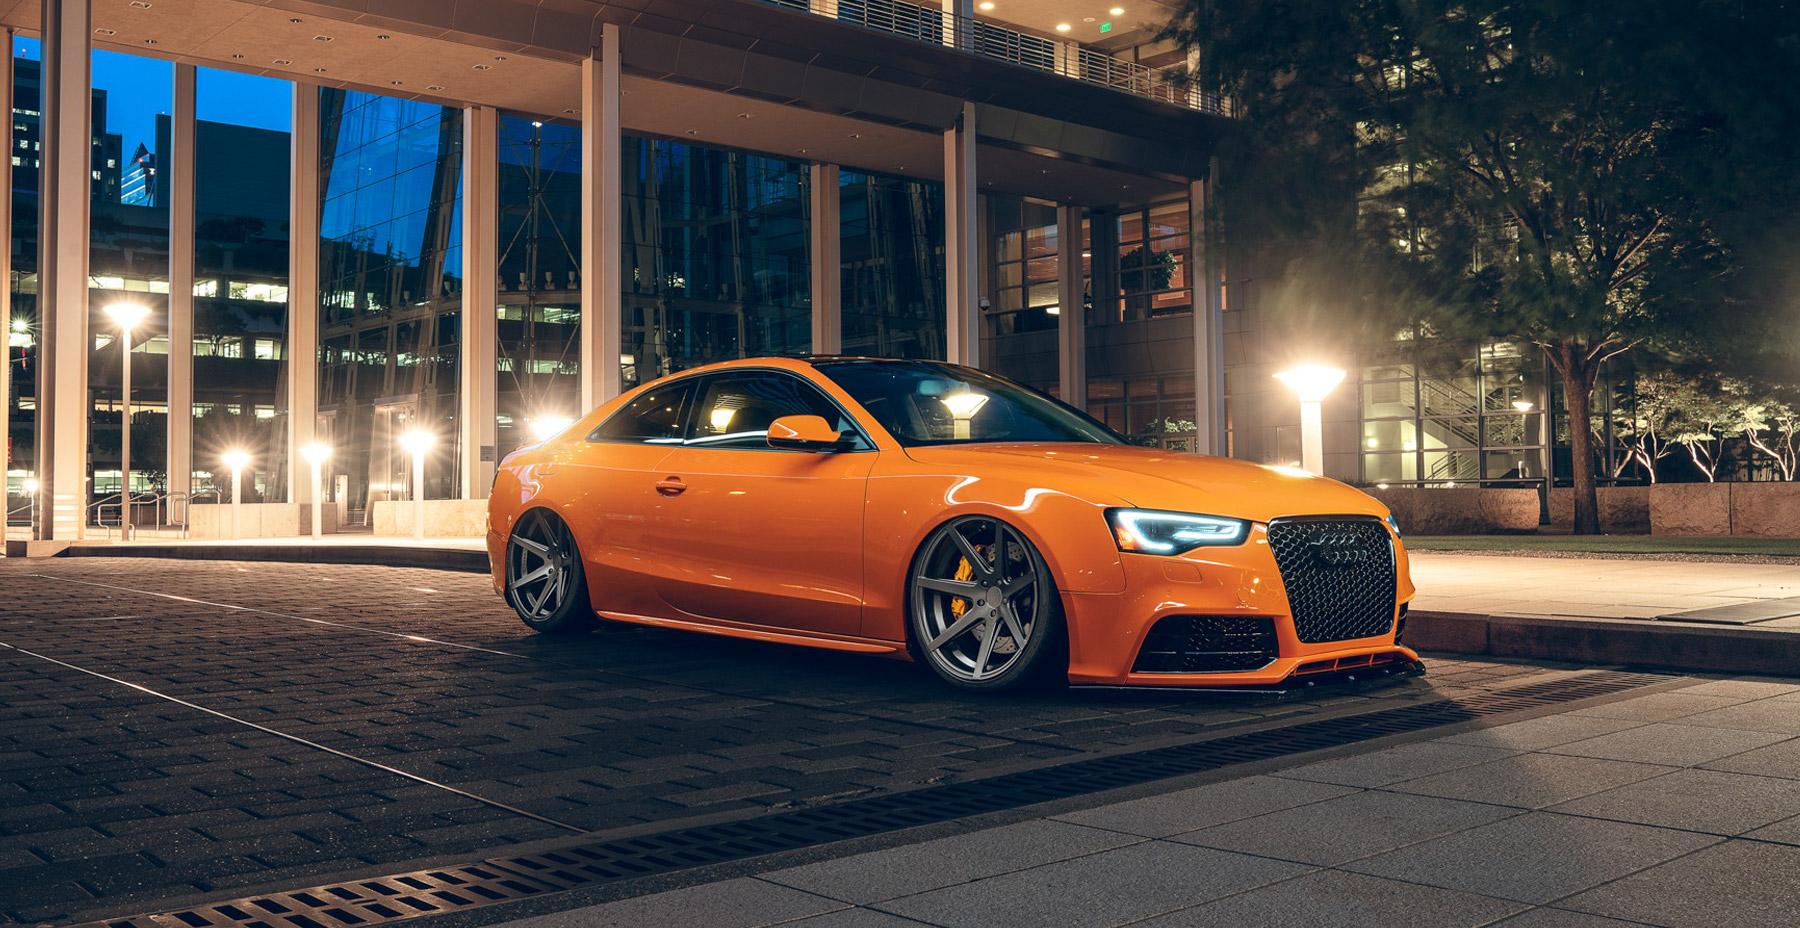 Orange Audi A5 x Rohana RC7 Wheels (Finished in Matte Graphite)